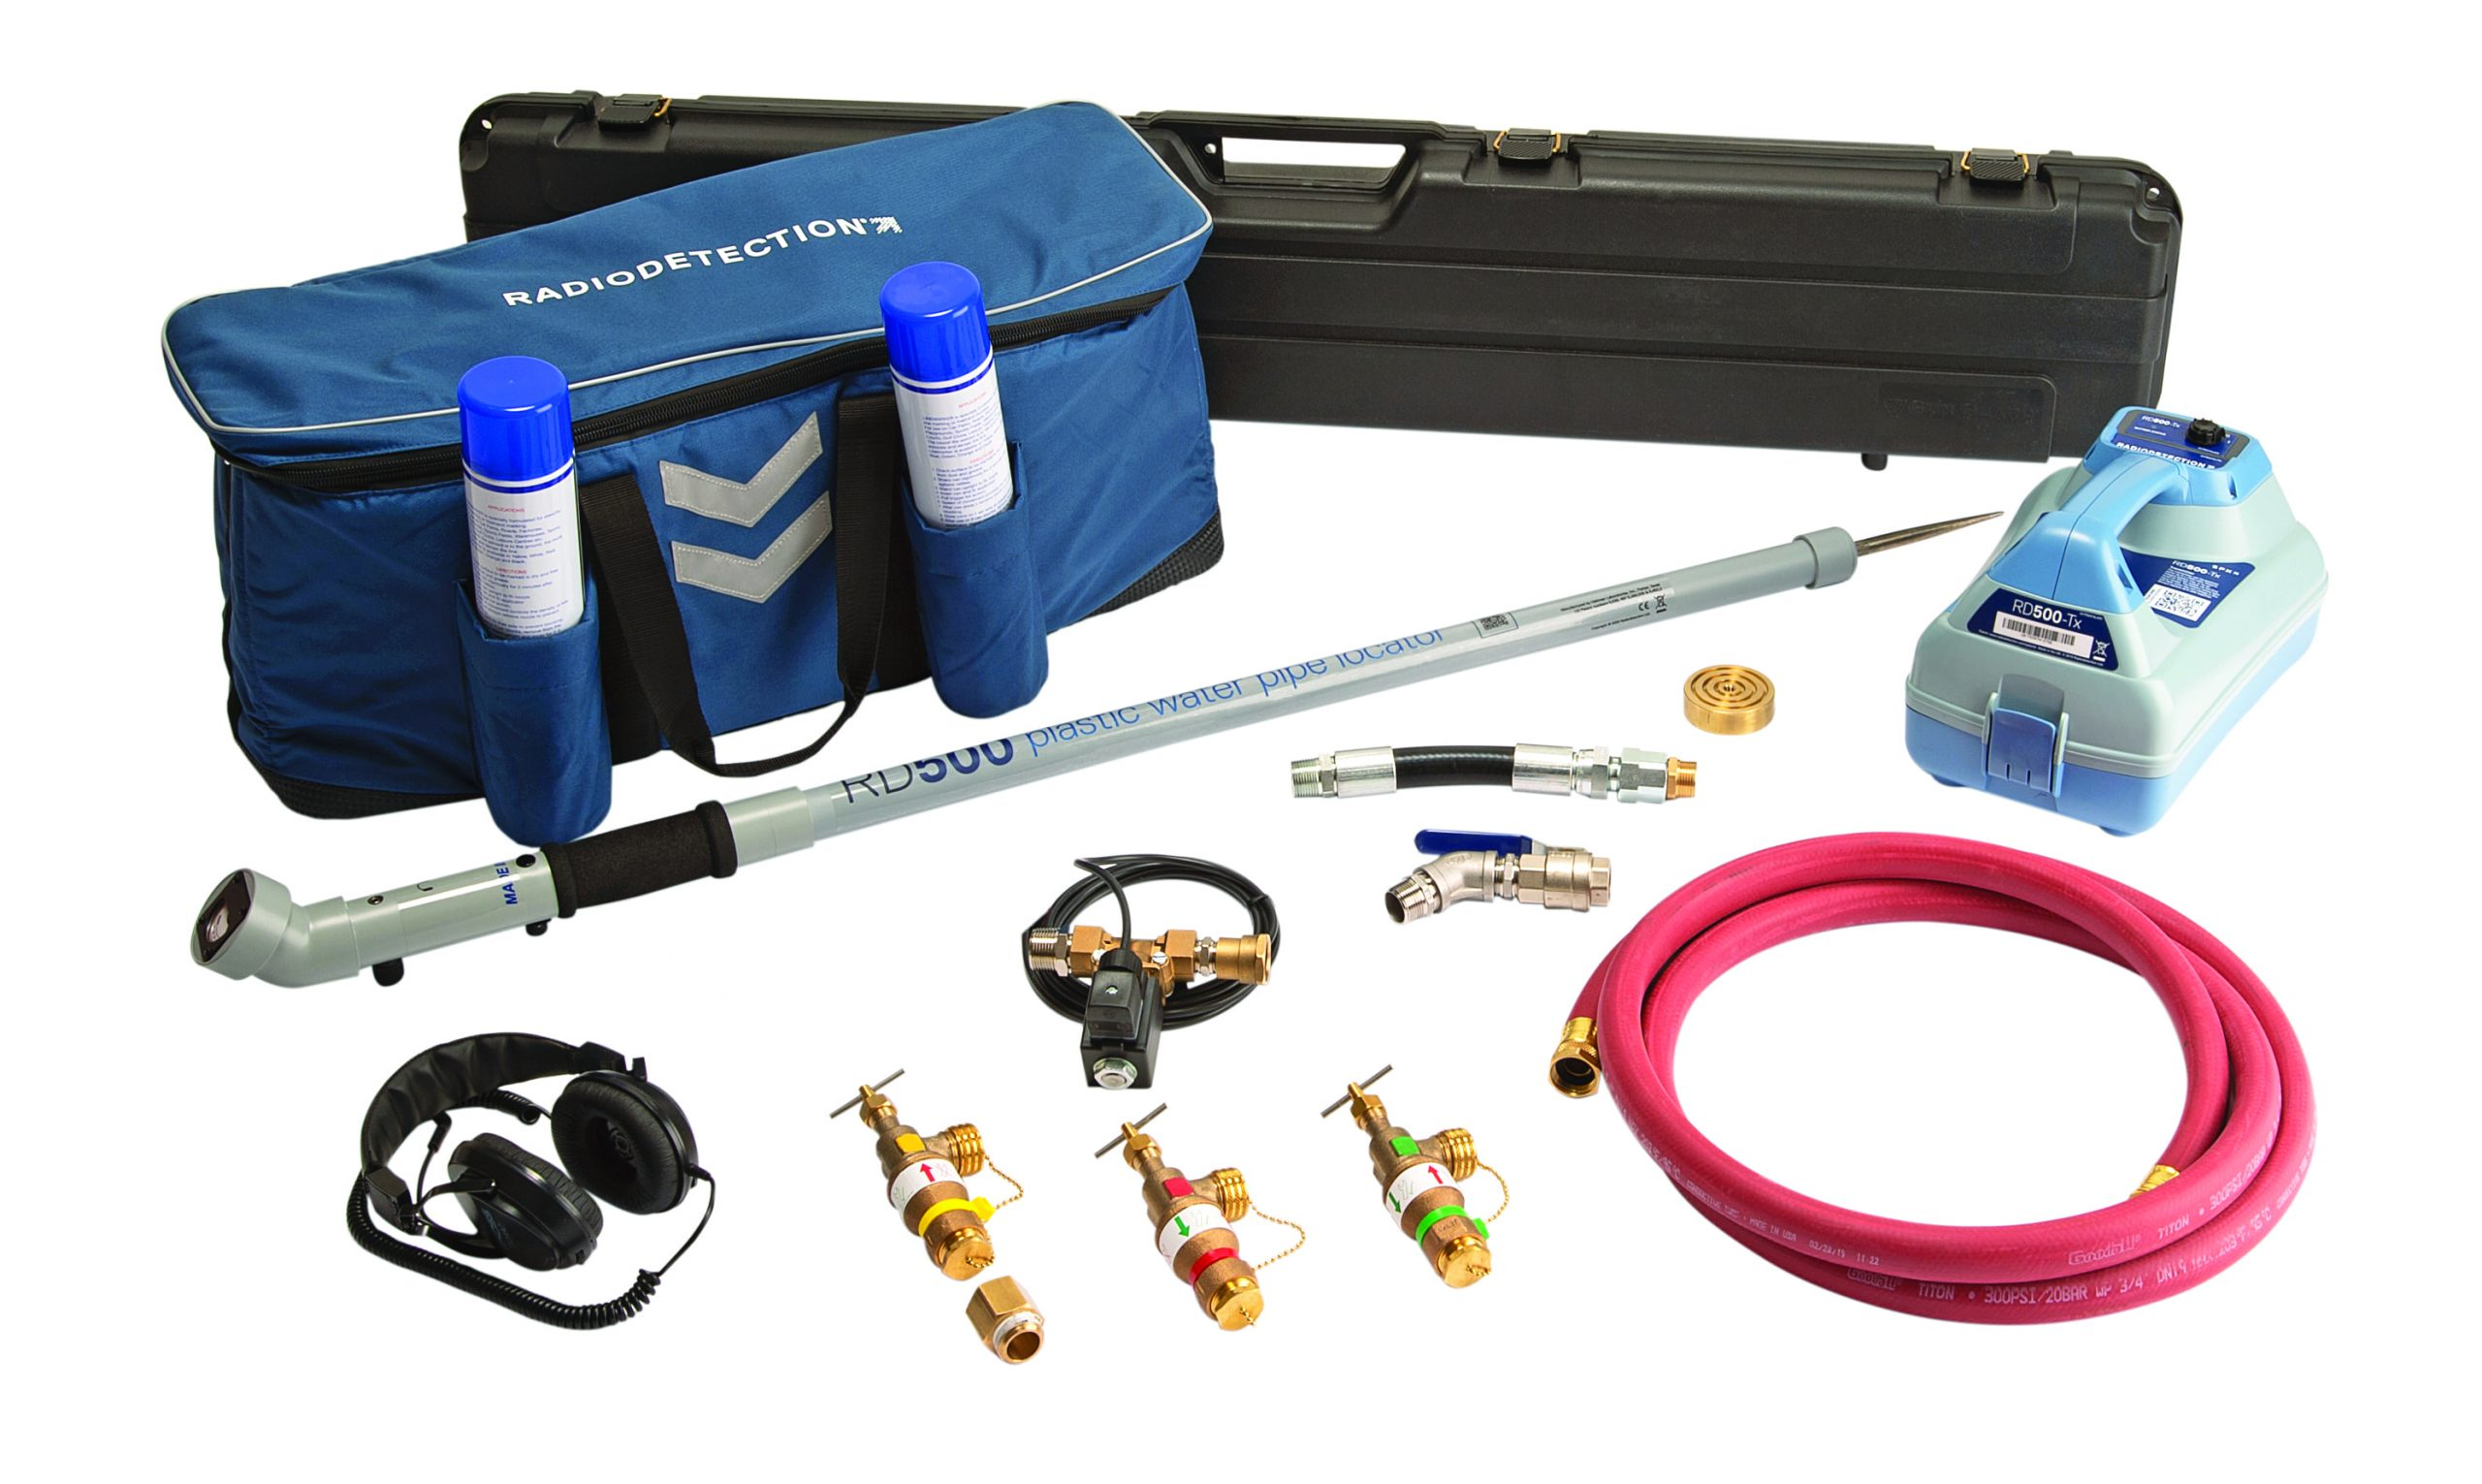 RD500-PRO Plast Pipe Locator Kit